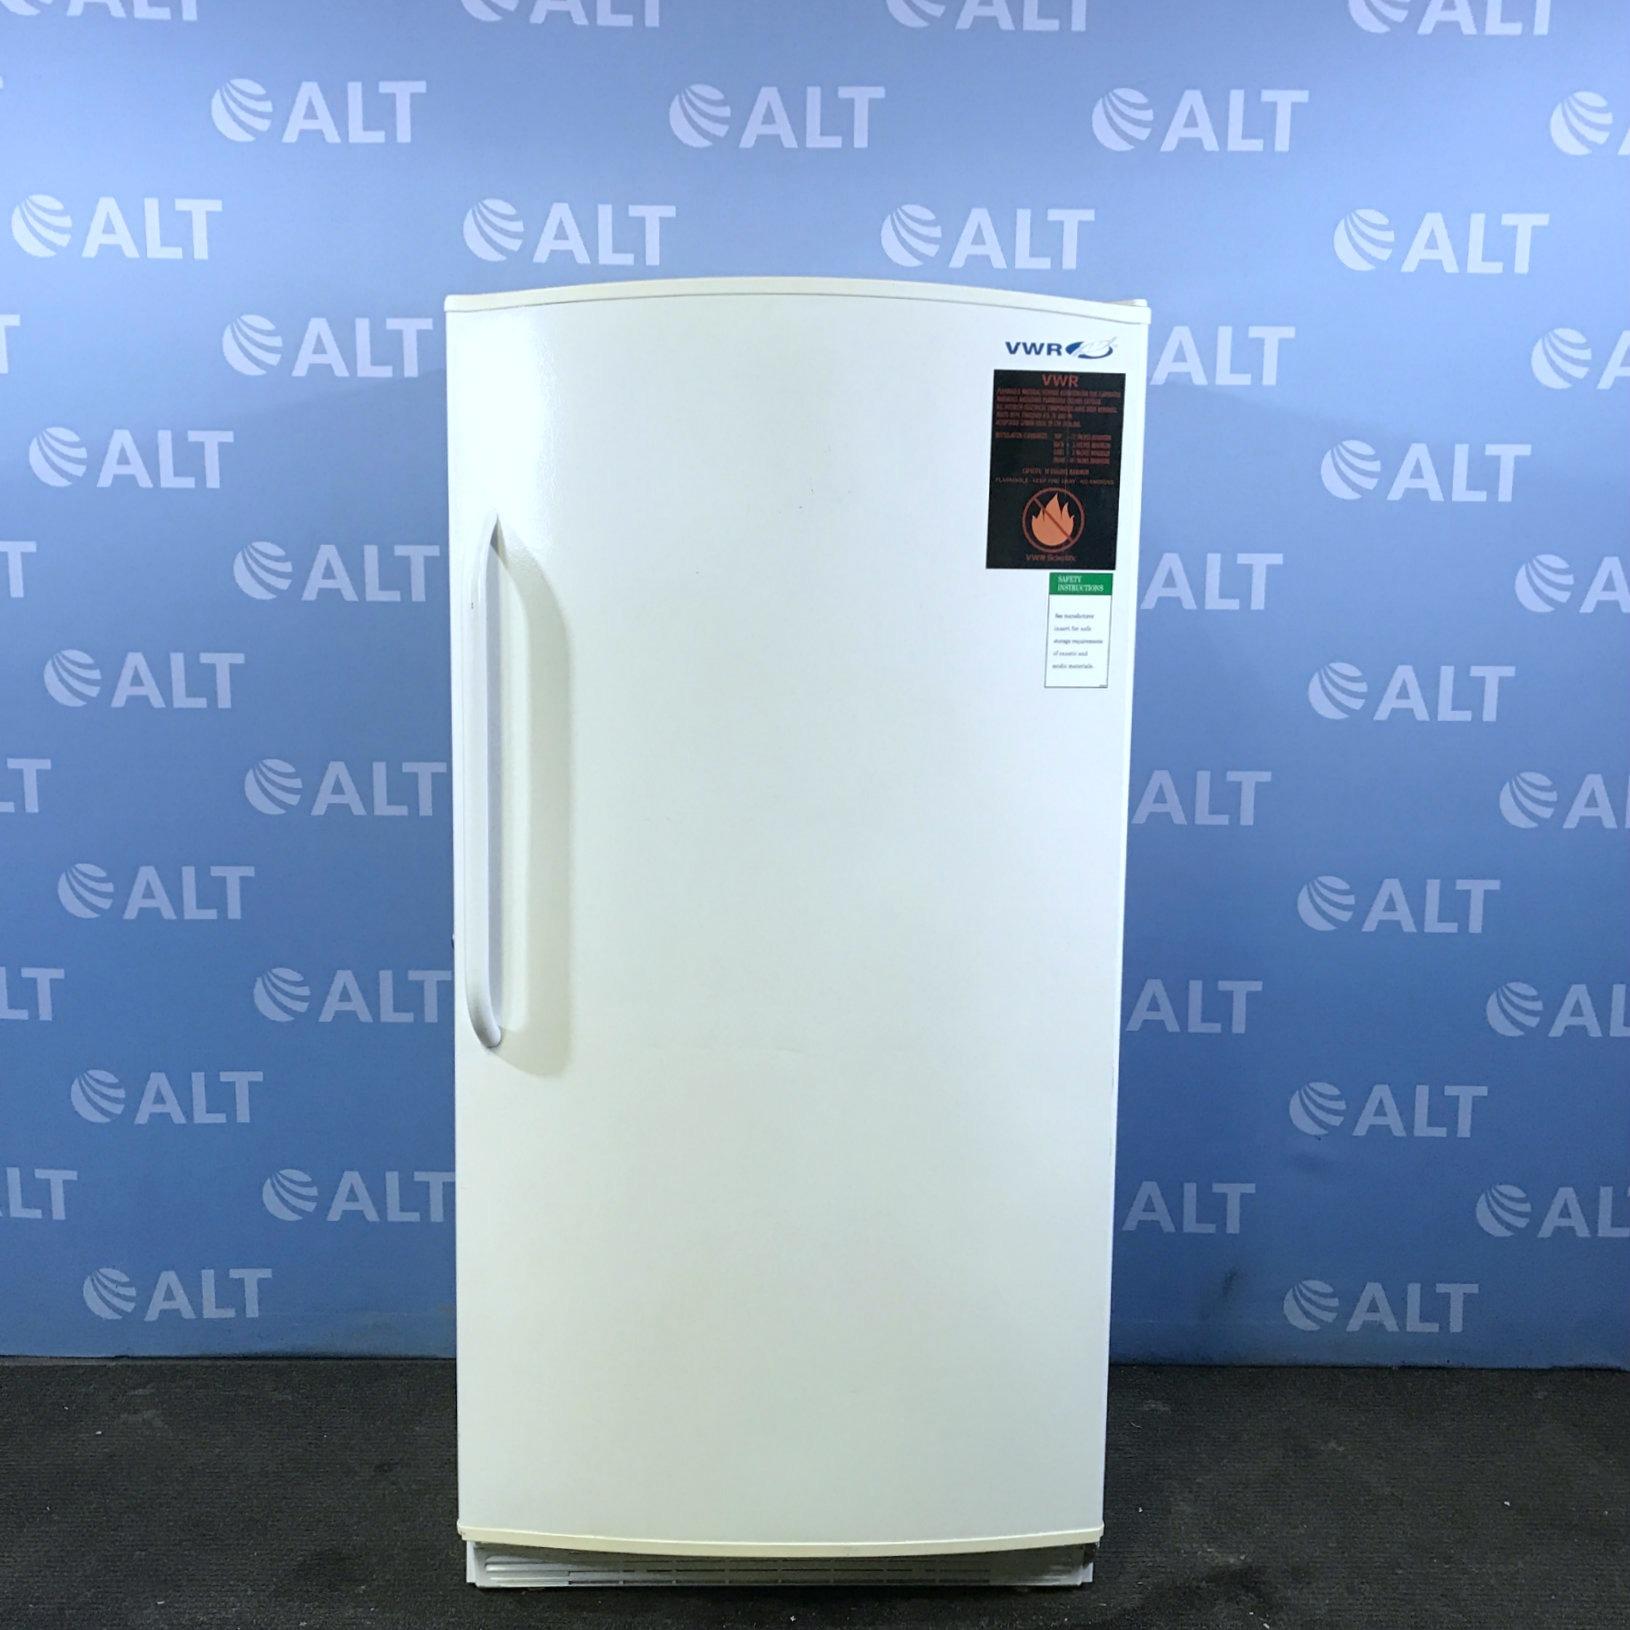 VWR U2020FA15 -20 Flammable Materials Freezer. Flammable Image